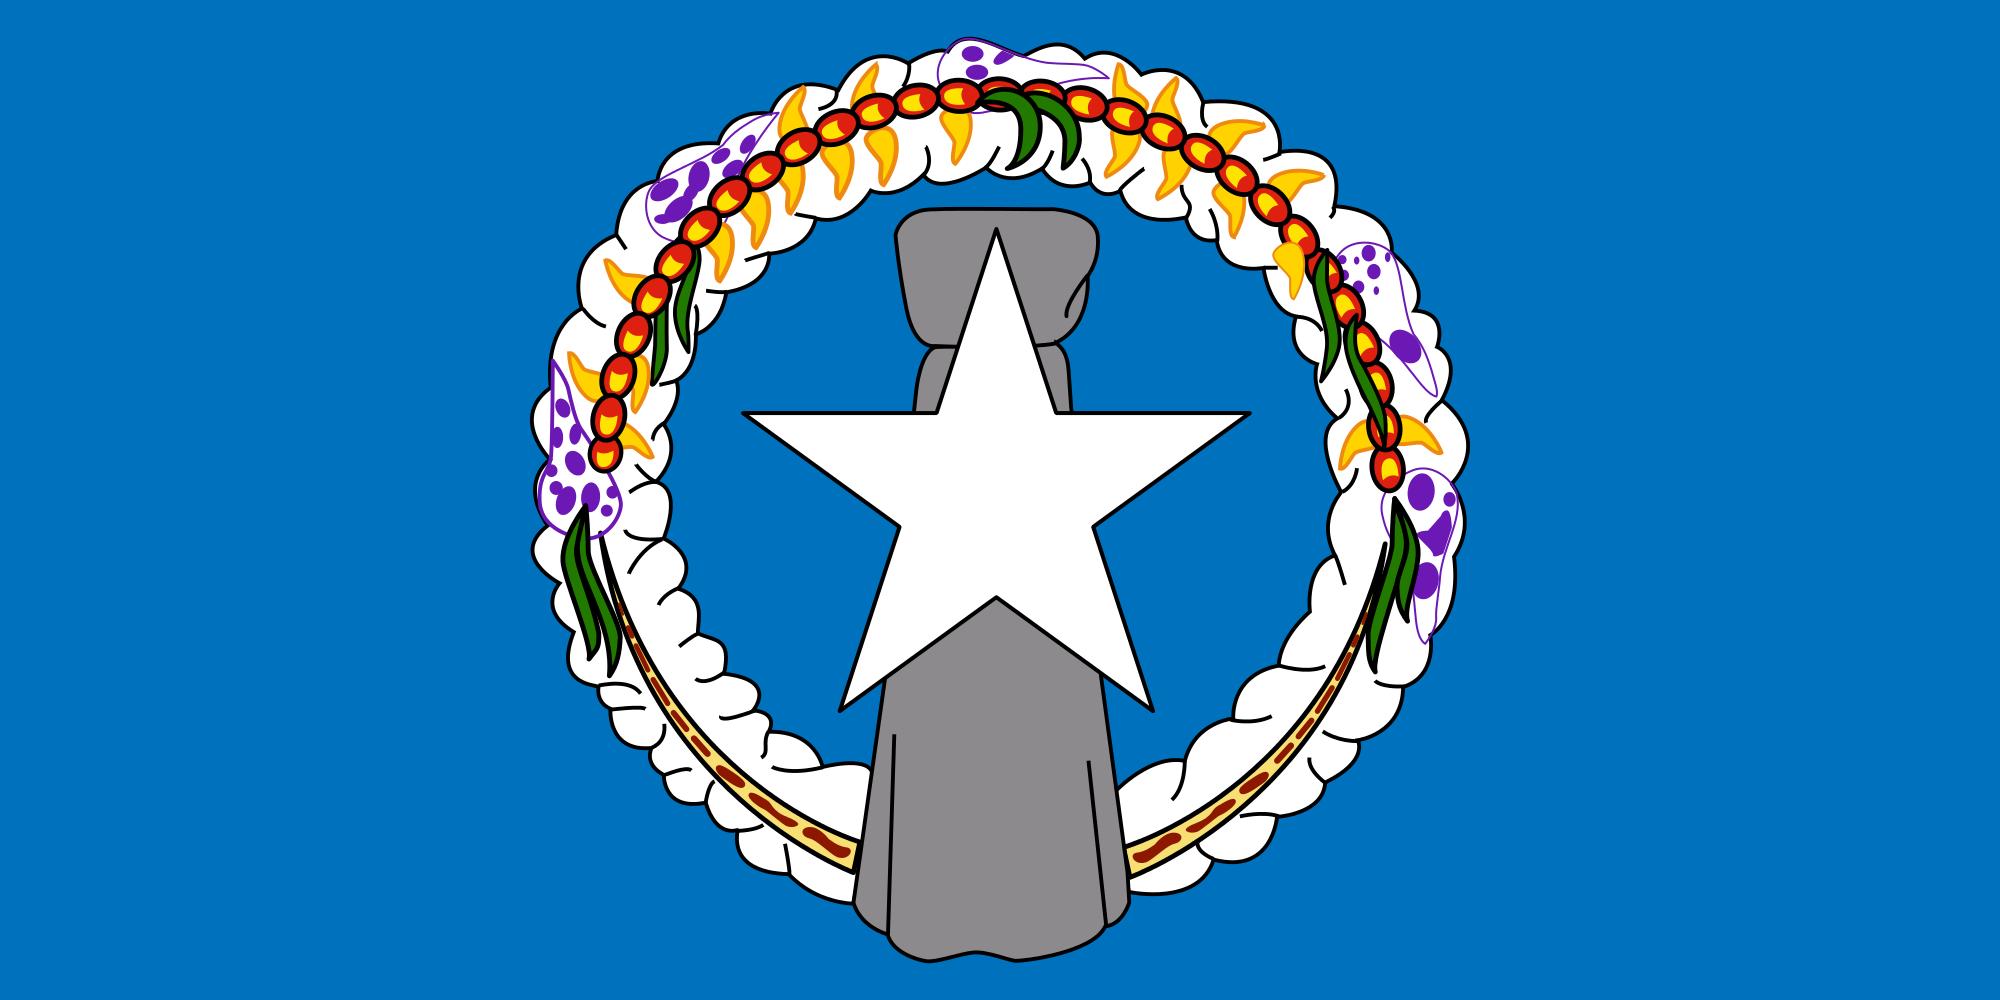 islas marianas del norte, देश, emblema, लोग�प्रतीकbolo - HD वॉलपेपर - प्रोफेसर-falken.com